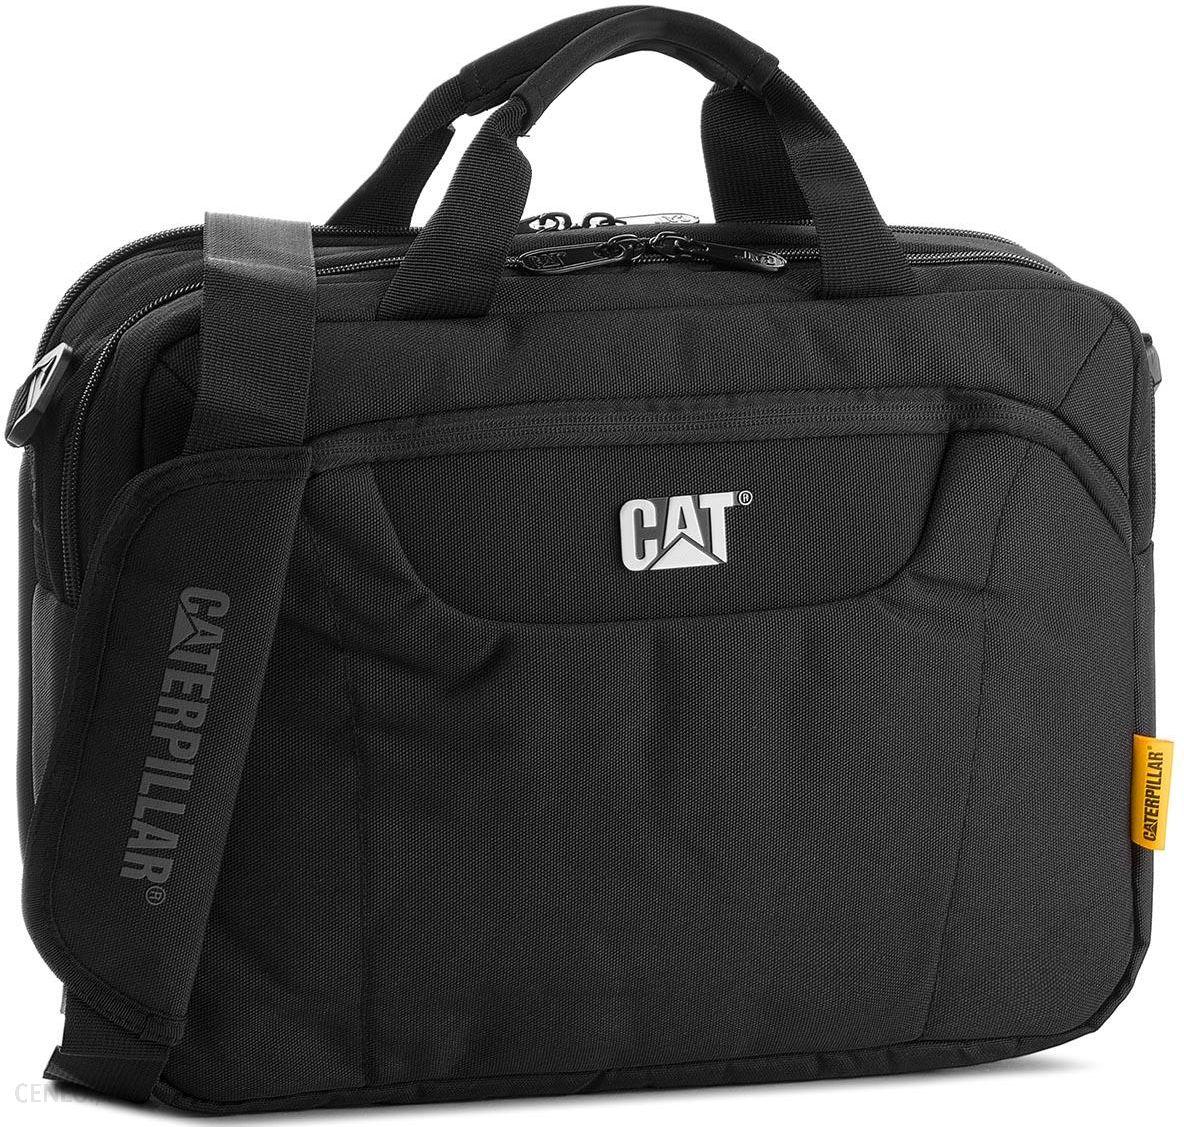 ba537e13878b7 Torba CATERPILLAR - Laptop Messenger 83477 Black 01 - Ceny i opinie ...